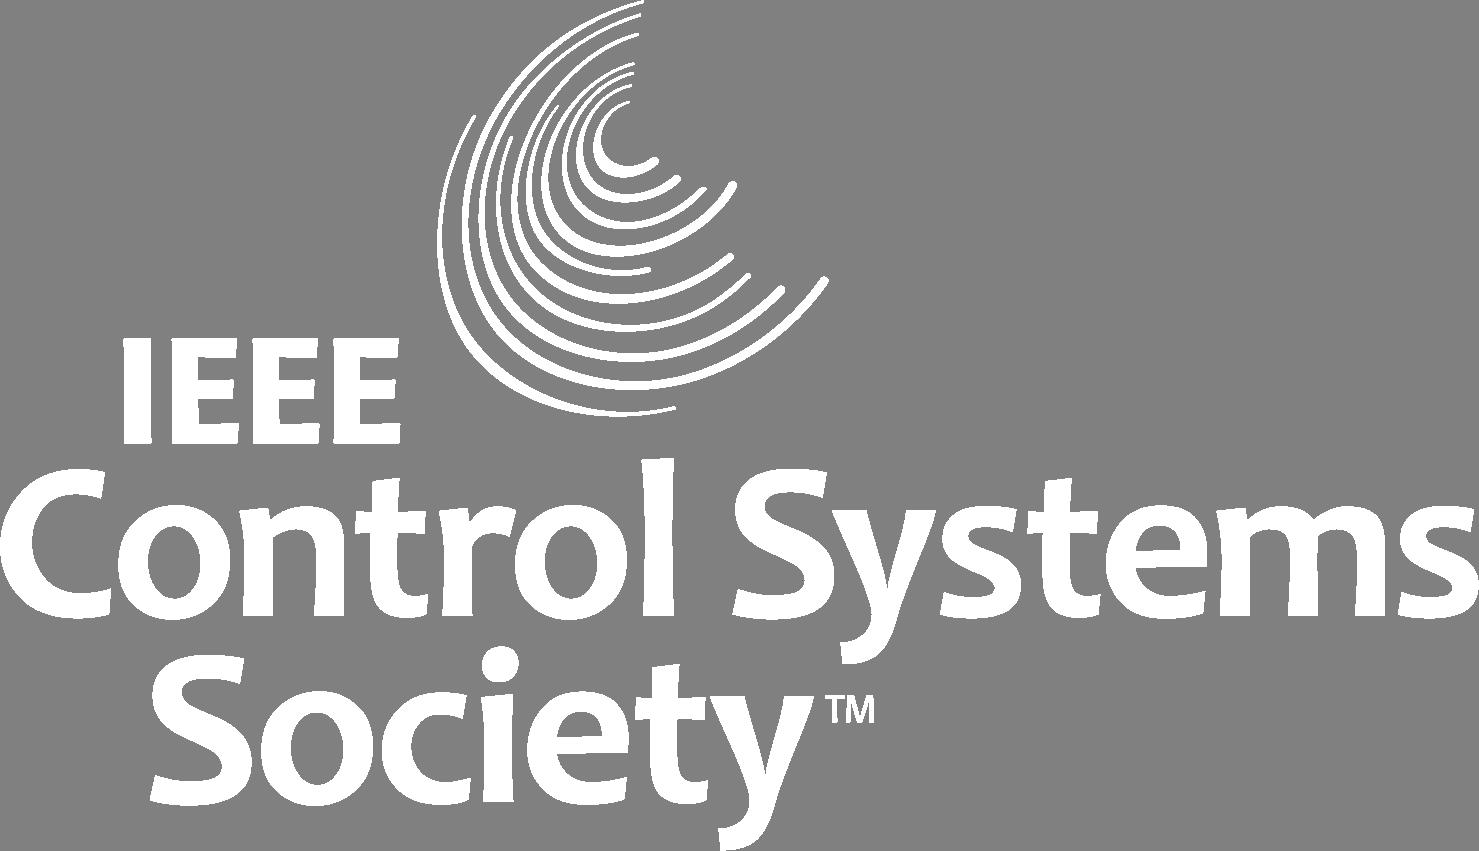 CDC 2019 Program   Wednesday December 11, 2019